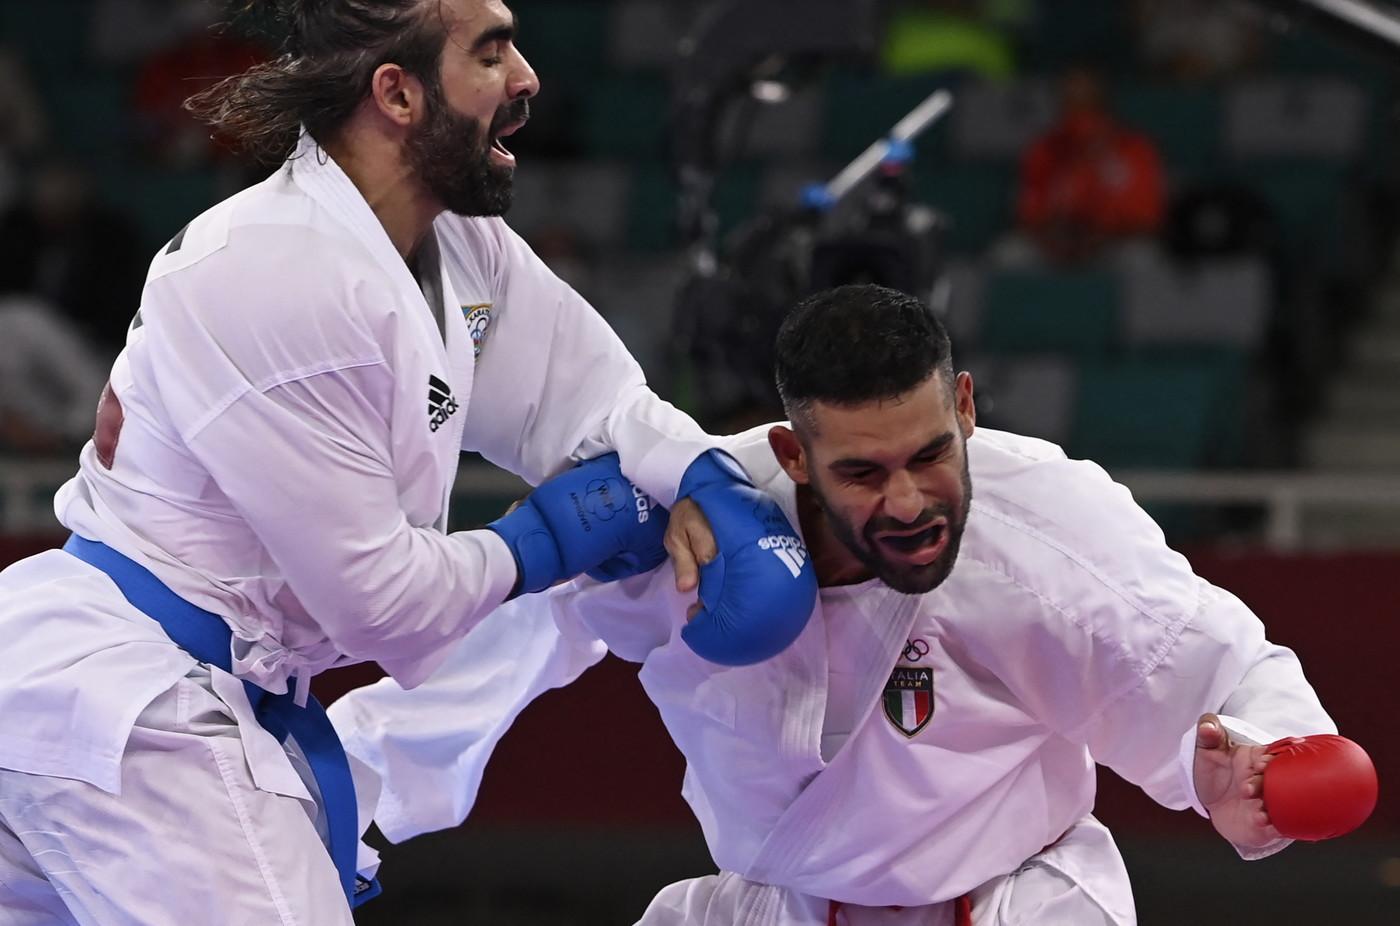 Tokyo 2020, karate: Busà conquista un oro da record! Battuto Aghayev in  finale   News - Sportmediaset